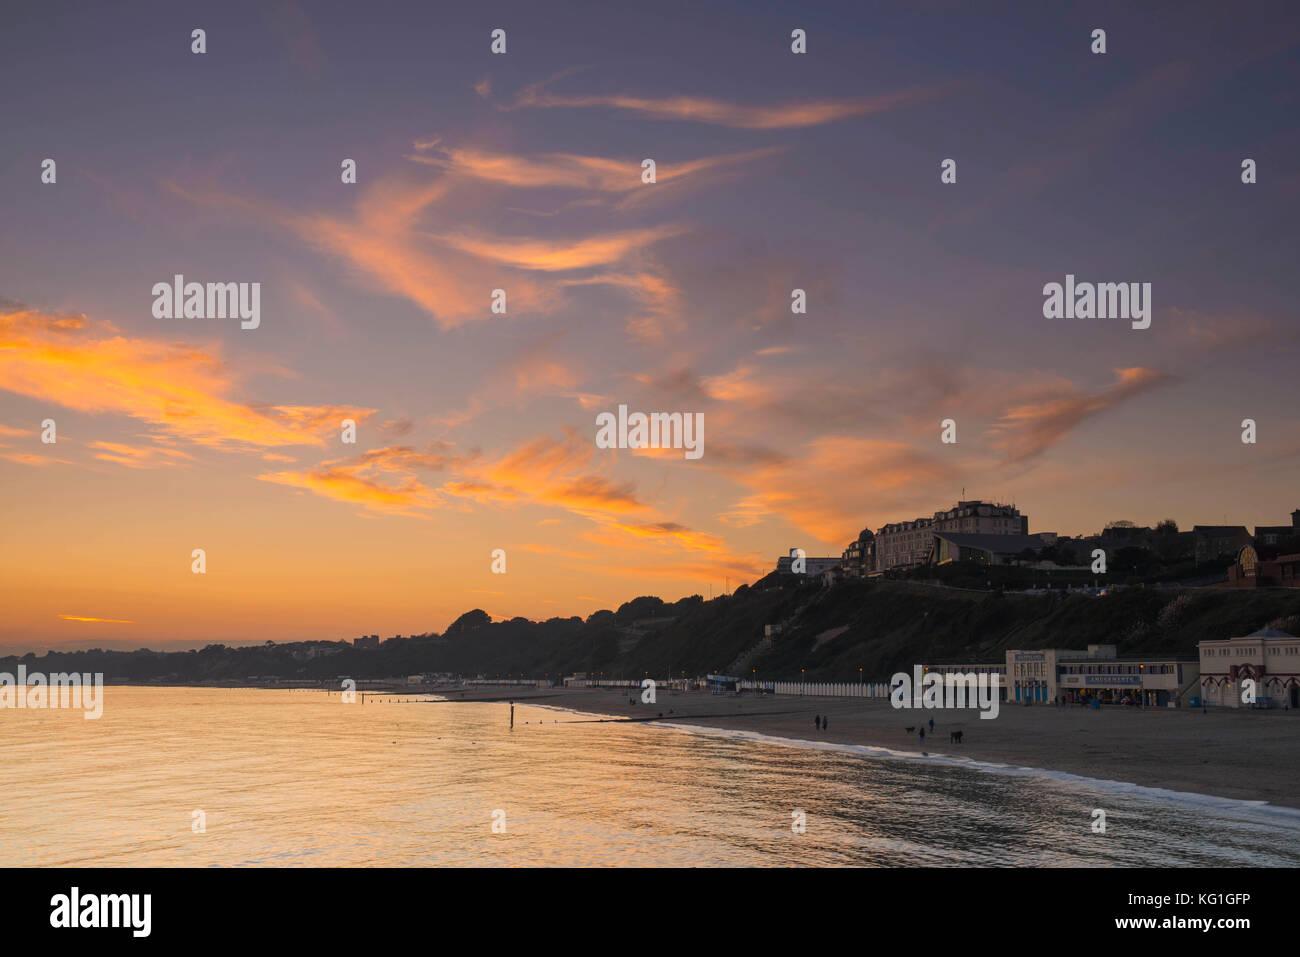 Bournemouth, Dorset, UK. 2nd November 2017.  UK Weather.   Spectacular sunset above Bournemouth beach in Dorset - Stock Image